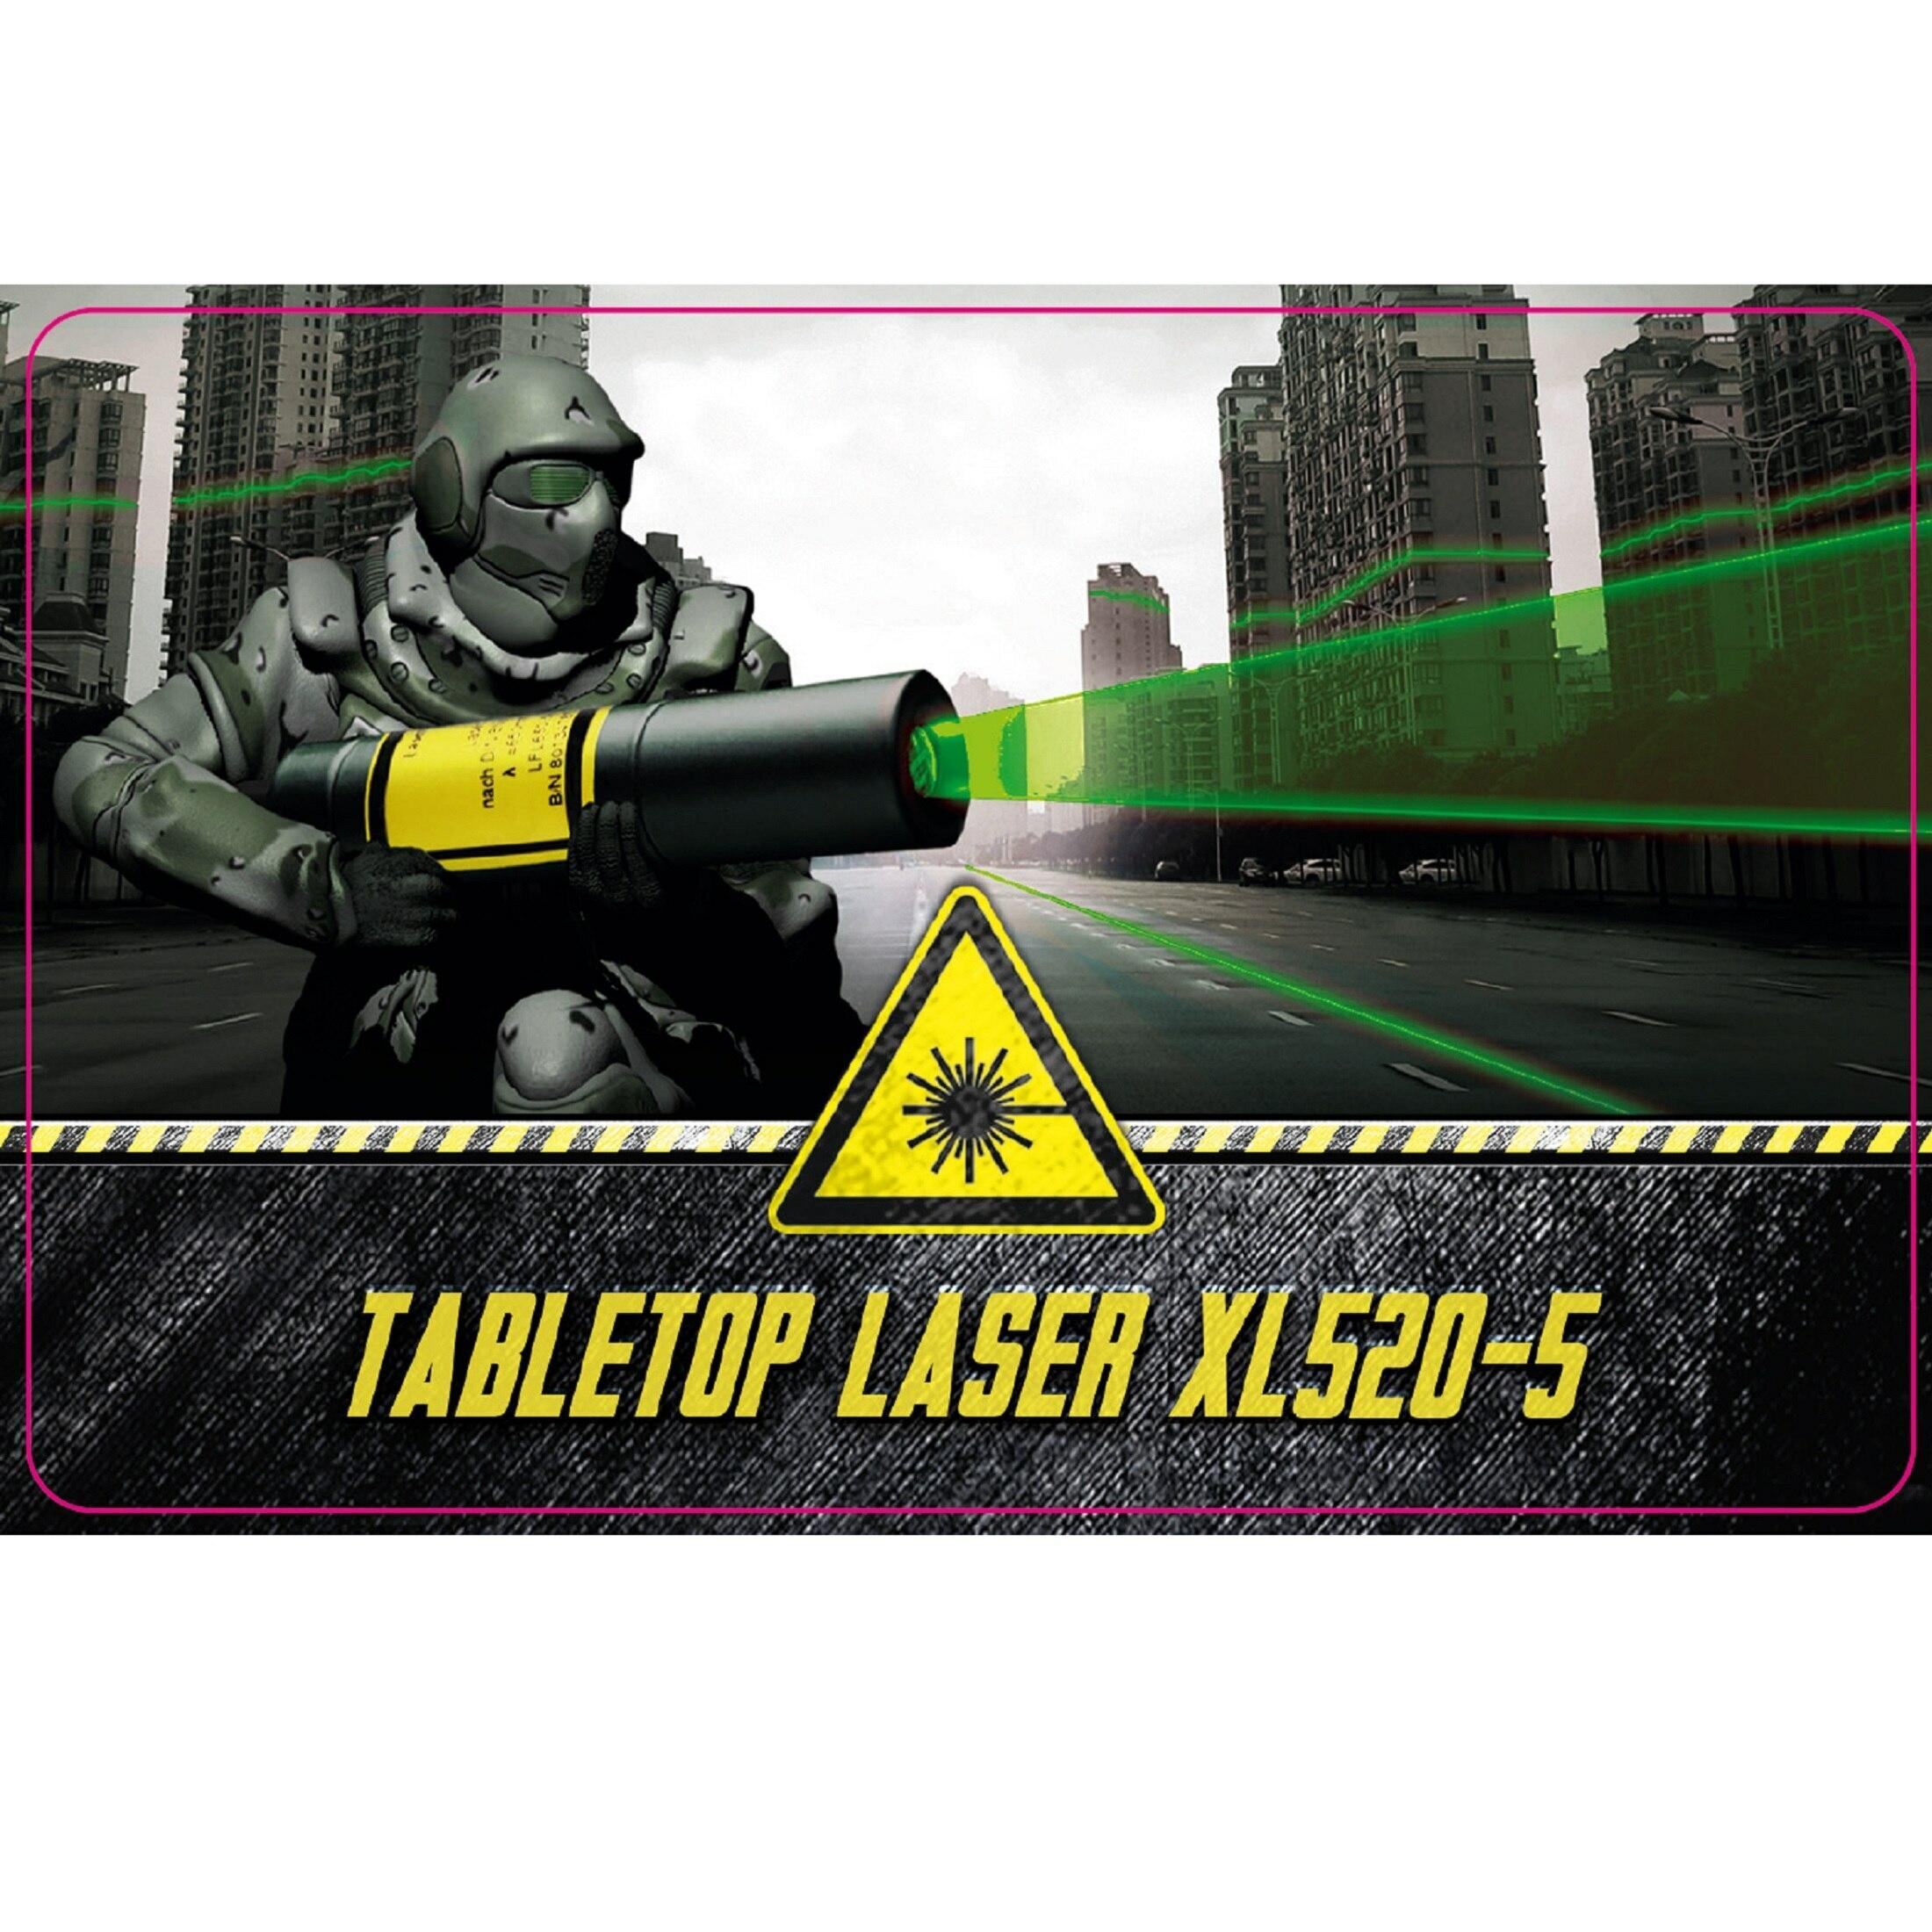 Picotronic laser XL520-5